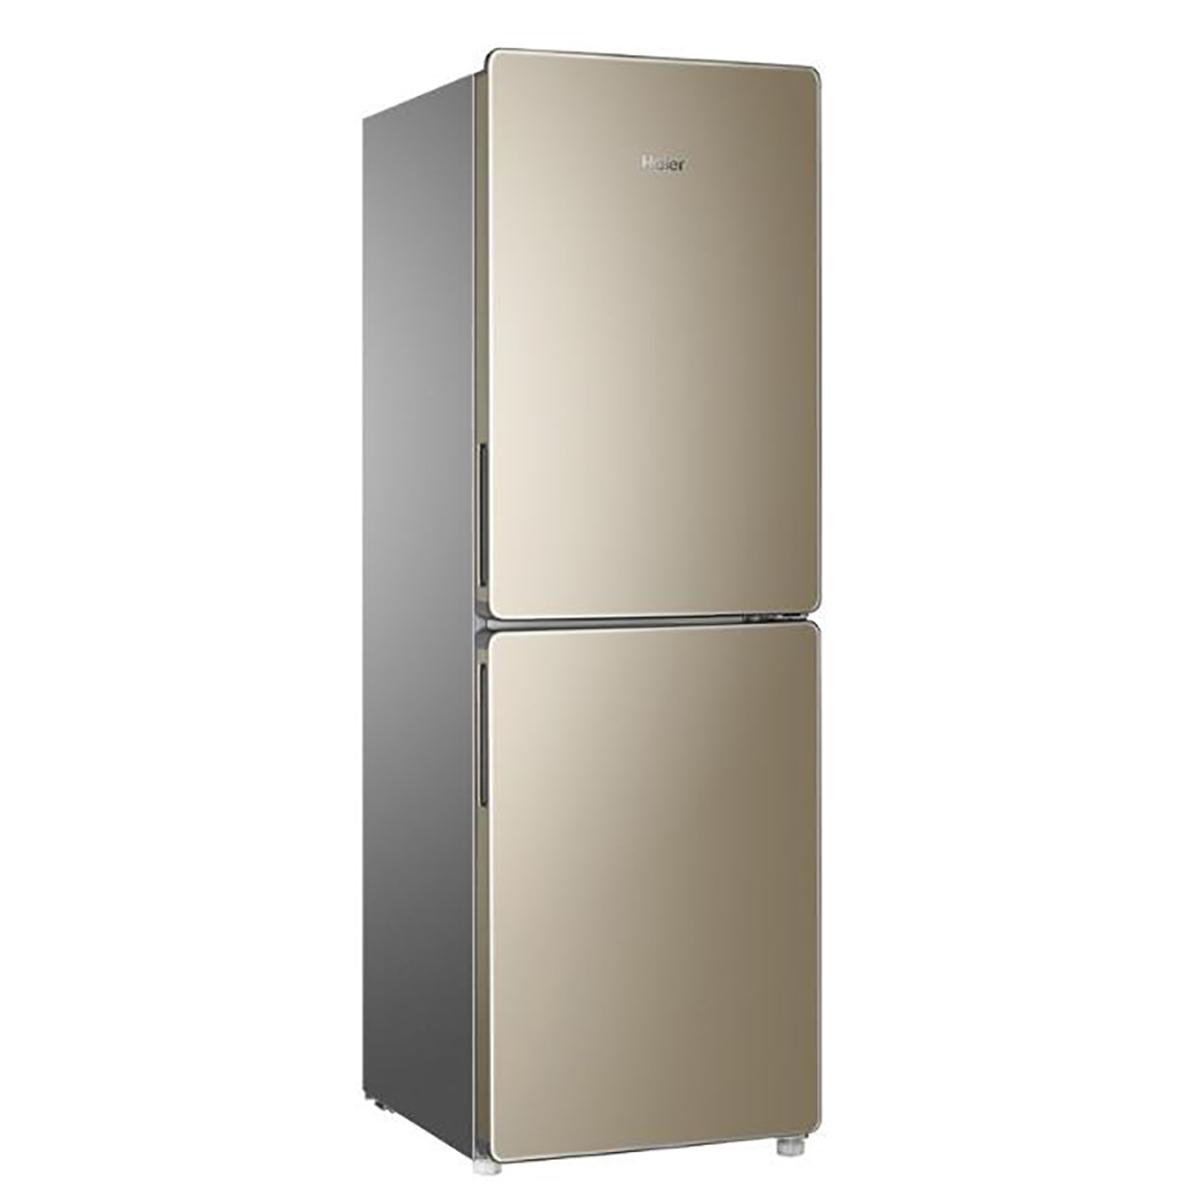 Haier/海尔                         冰箱                         BCD-190WDPT